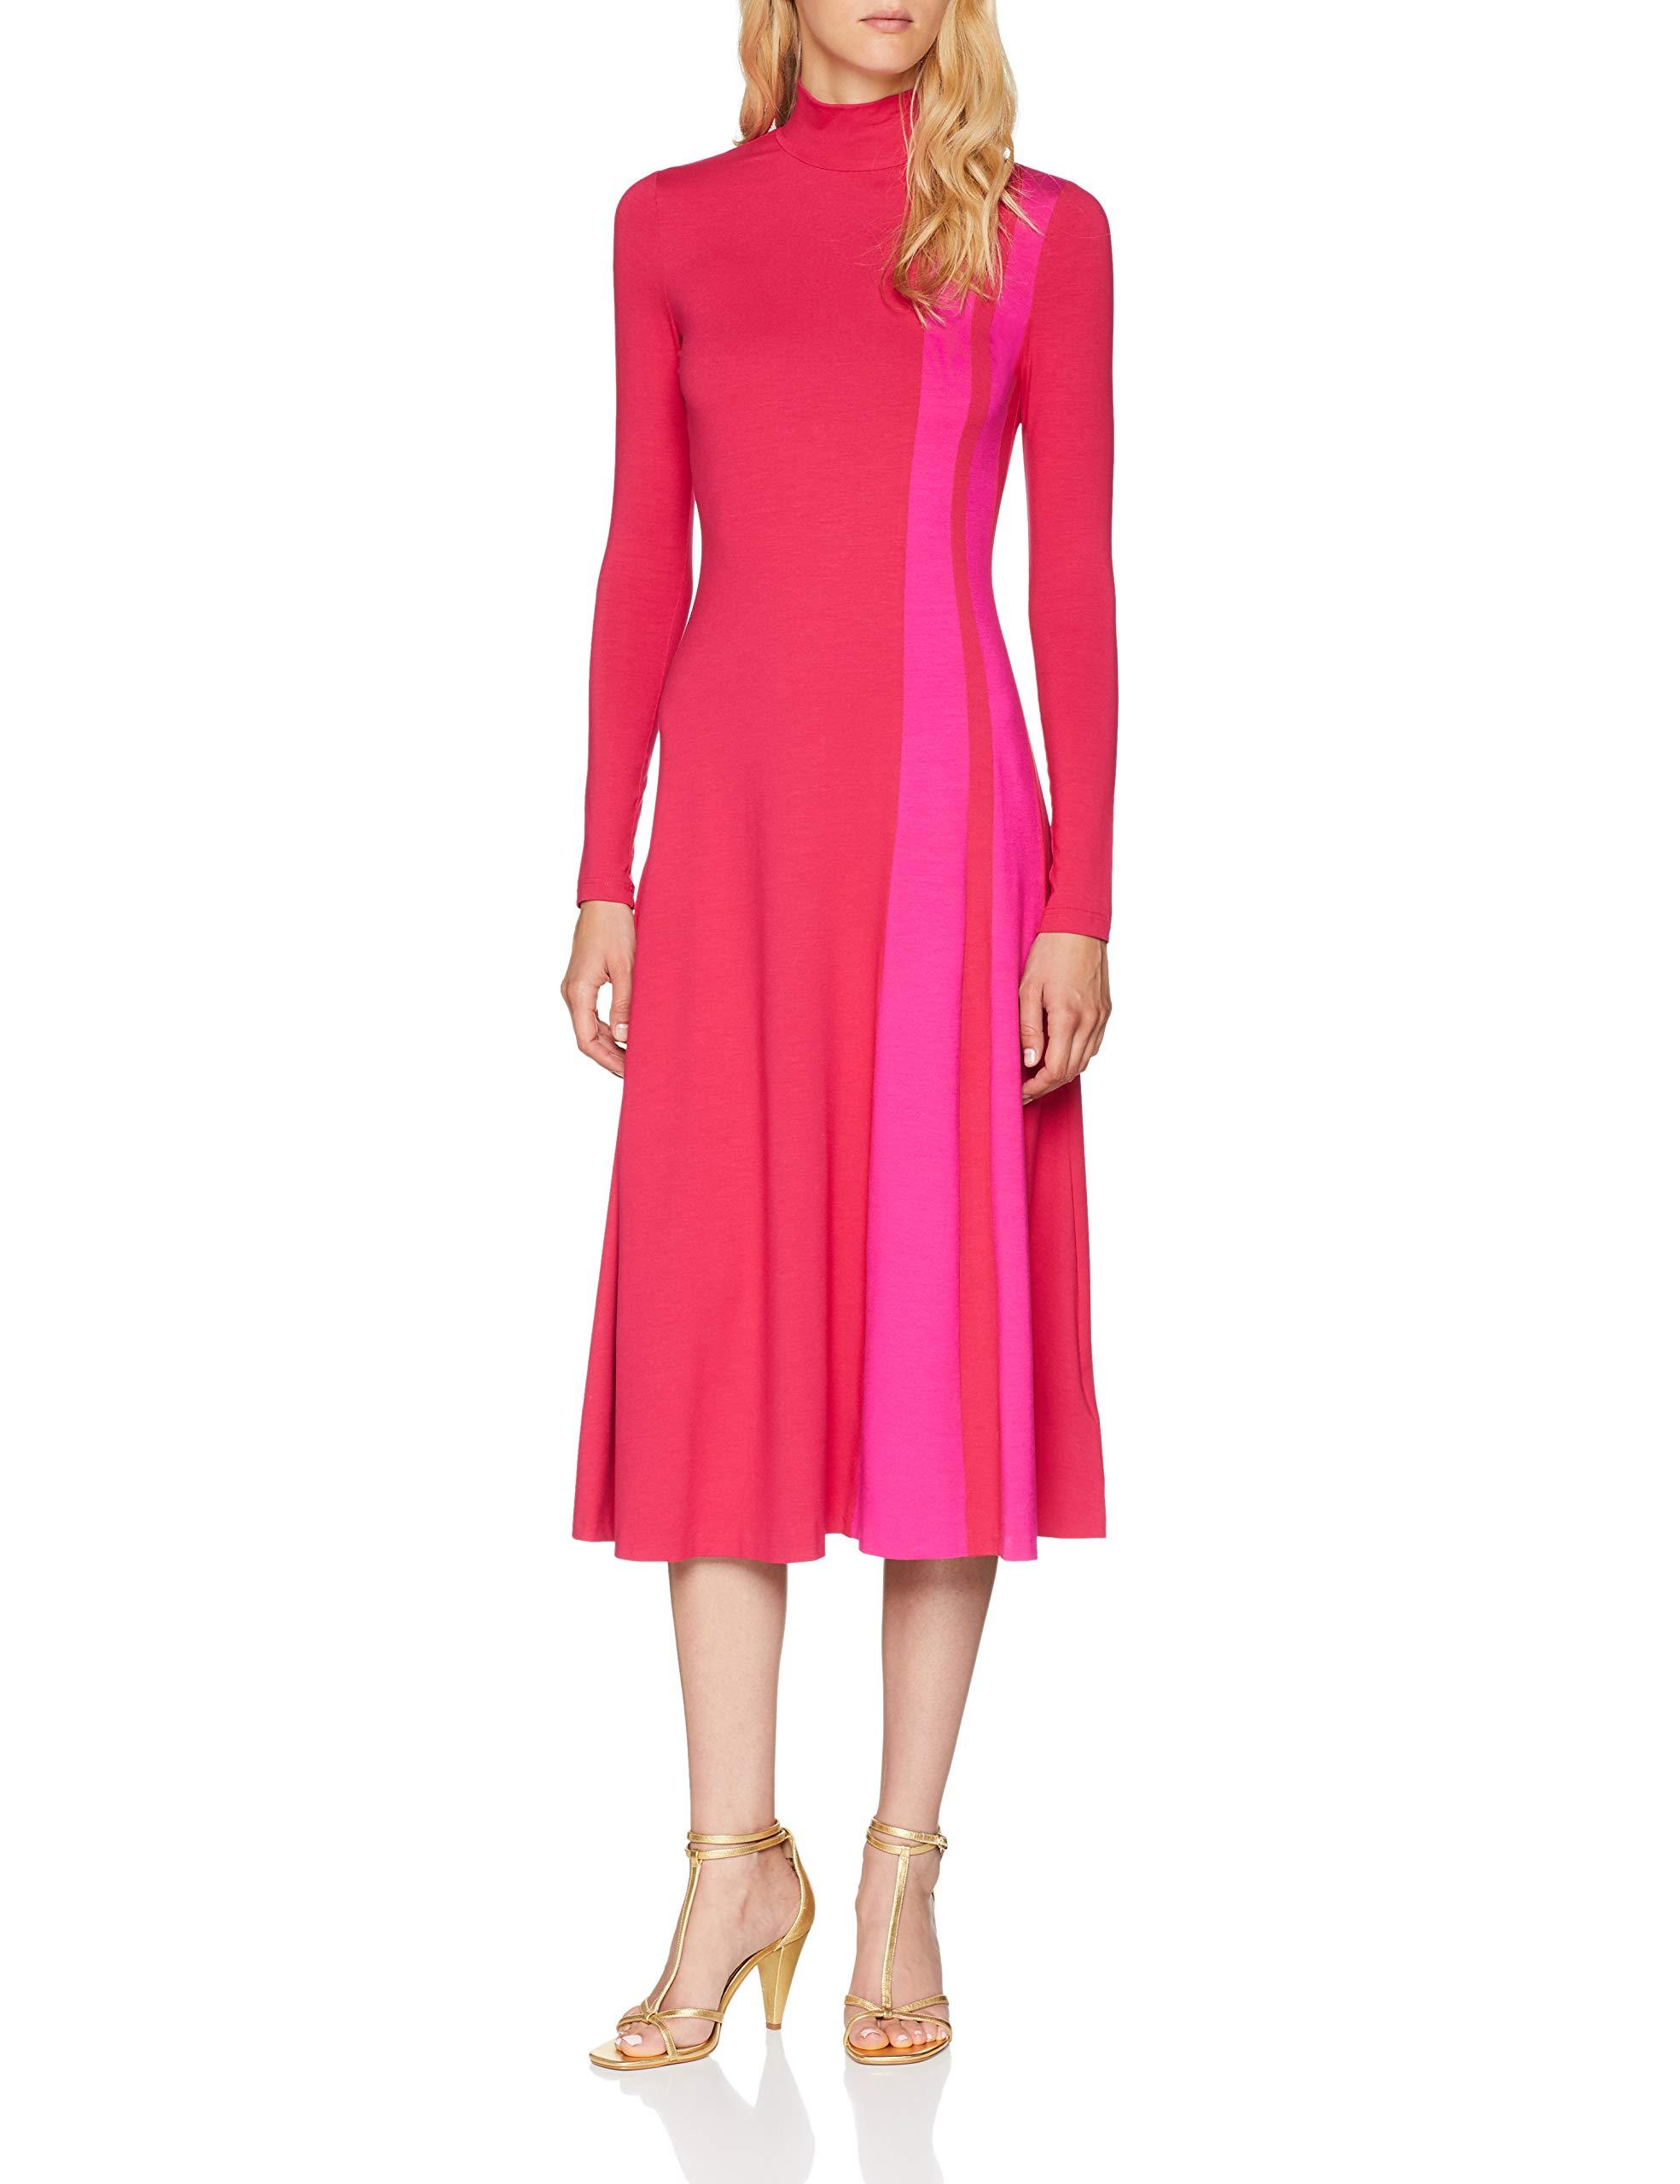 5027844 Sport Femme Pink Escada RobeRoseshocking B65242 TKc1FlJ3